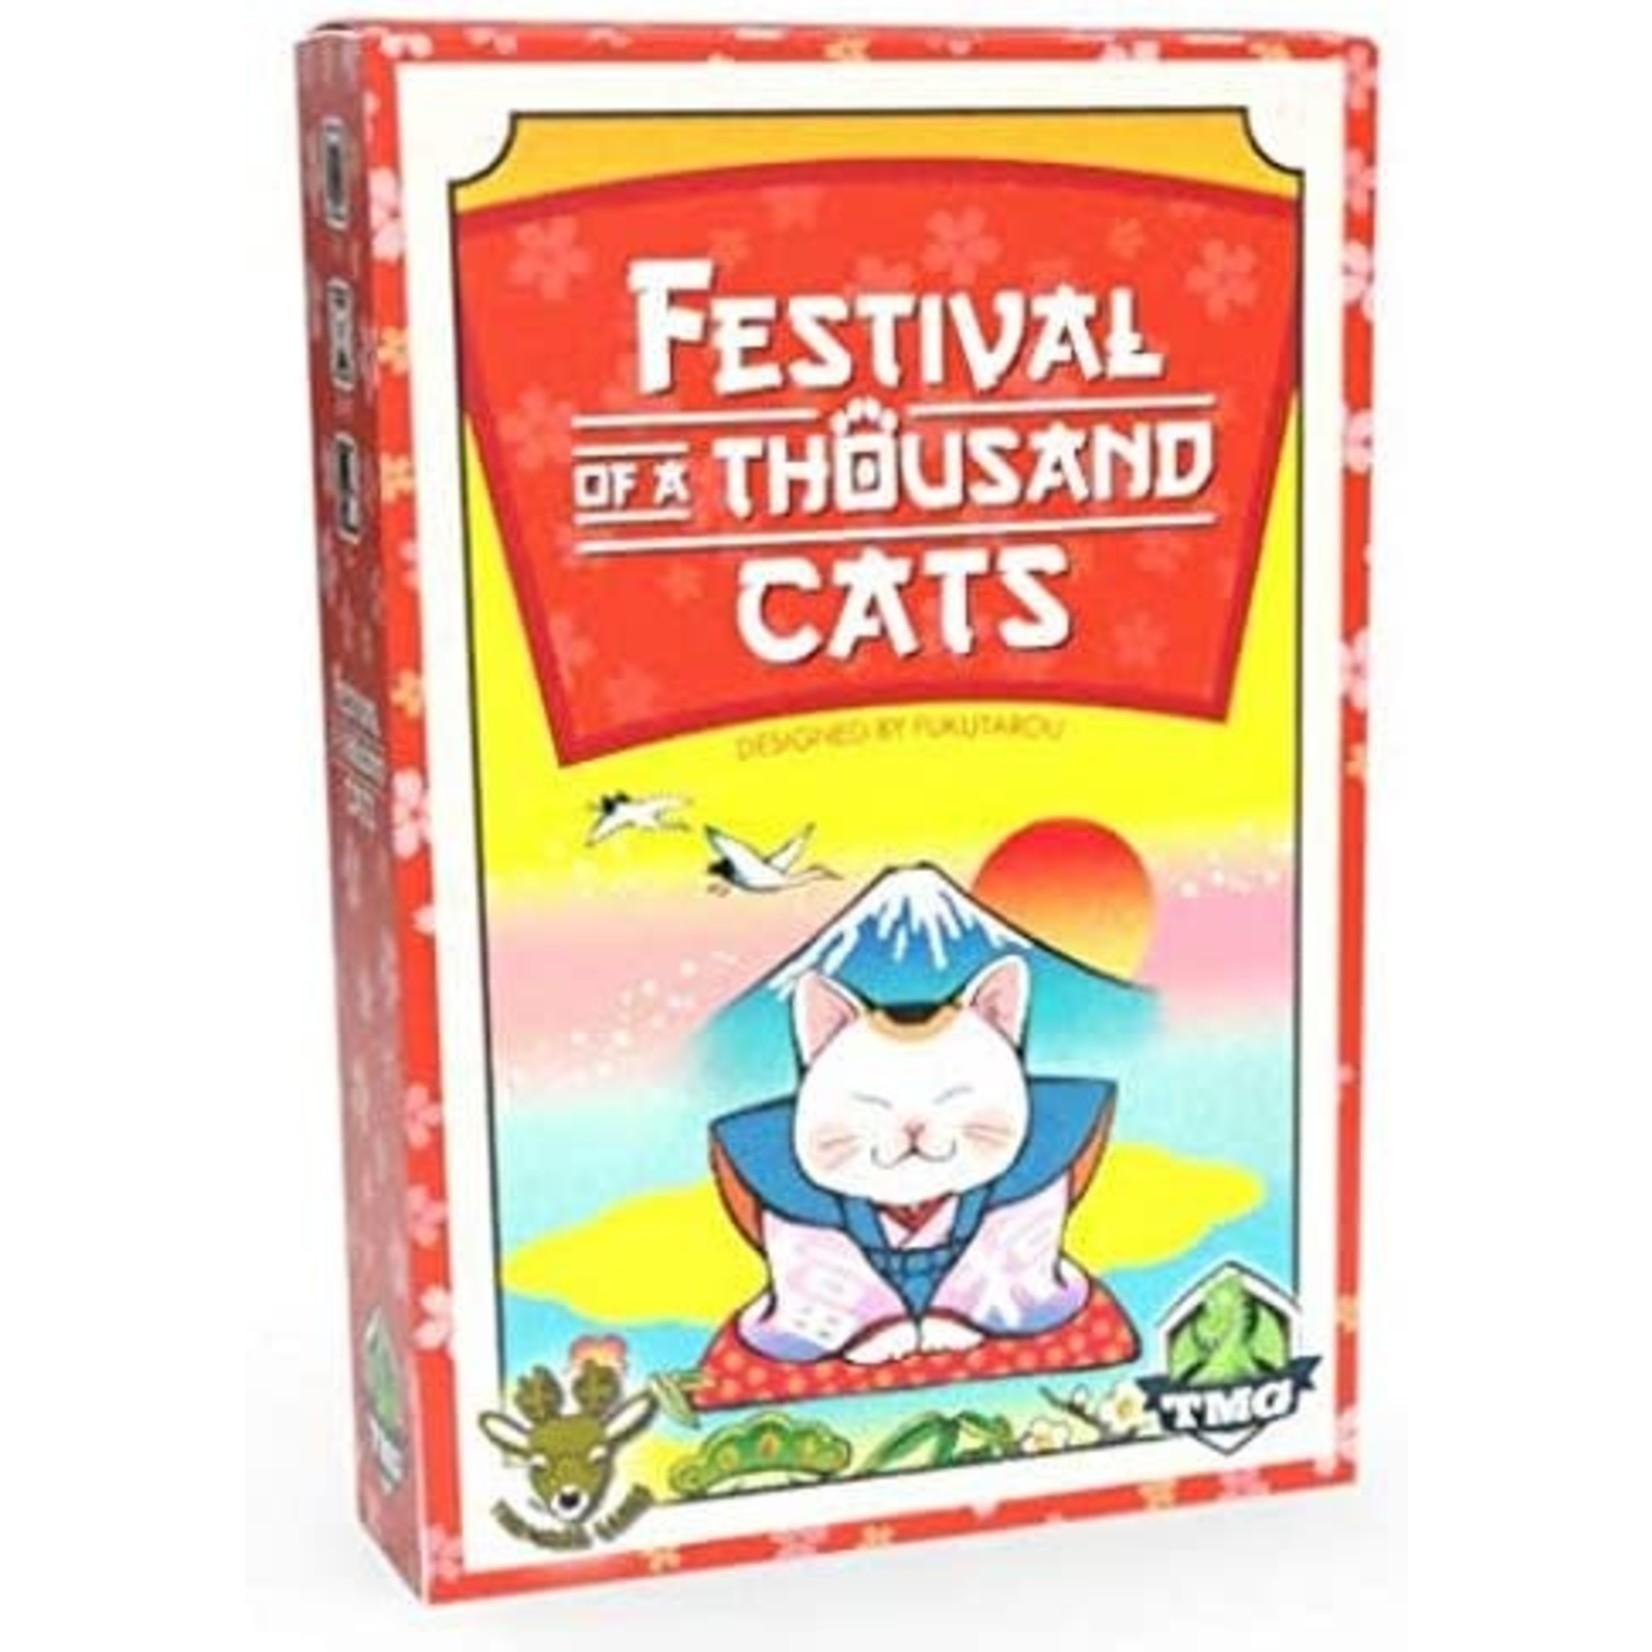 Tasty Minstrel Festival of a Thousand Cats